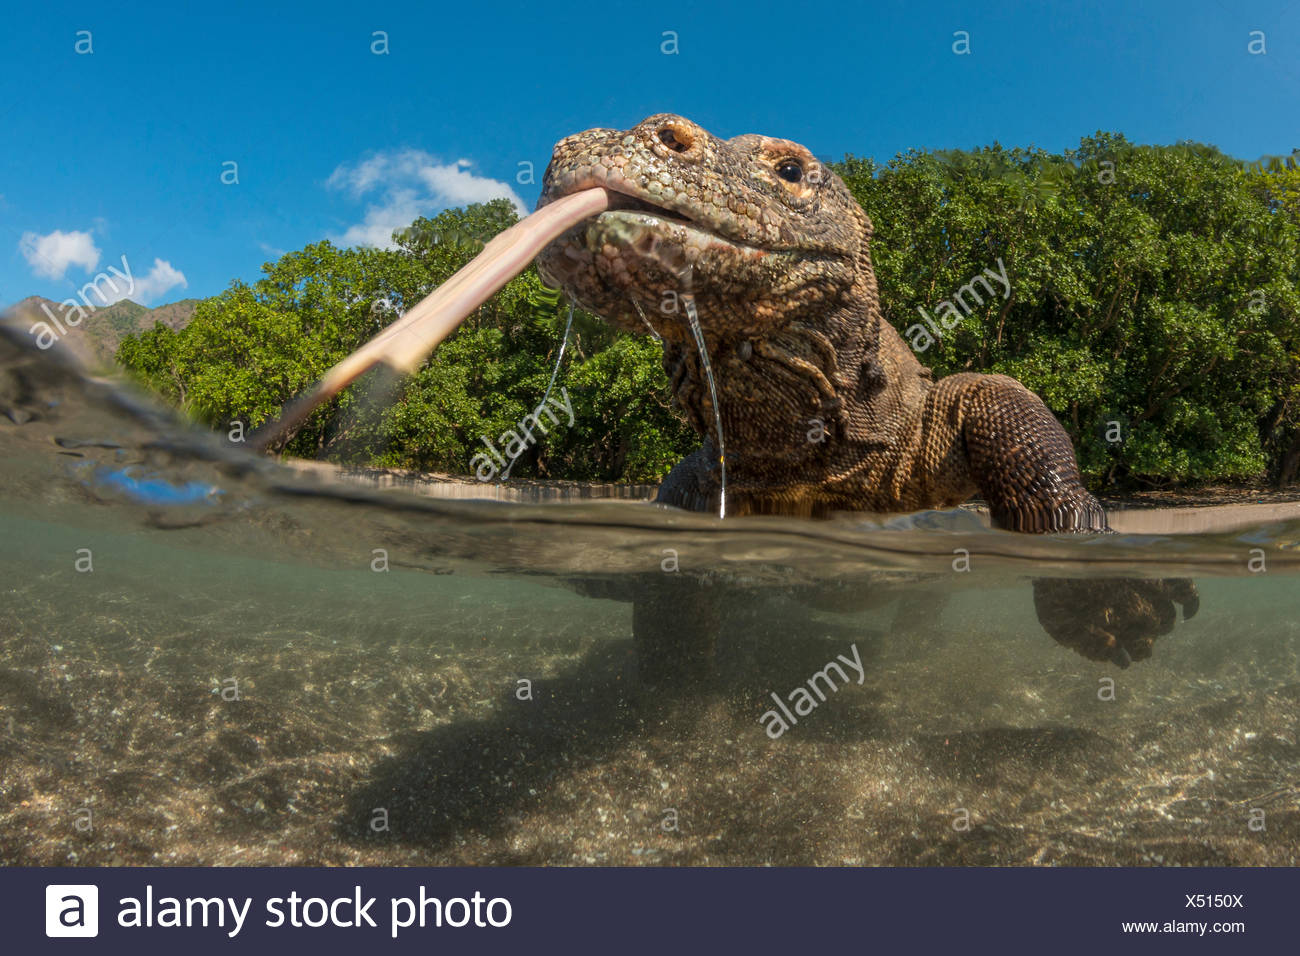 El dragón de Komodo, Varanus komodoensis, Komodo, Indonesia Imagen De Stock